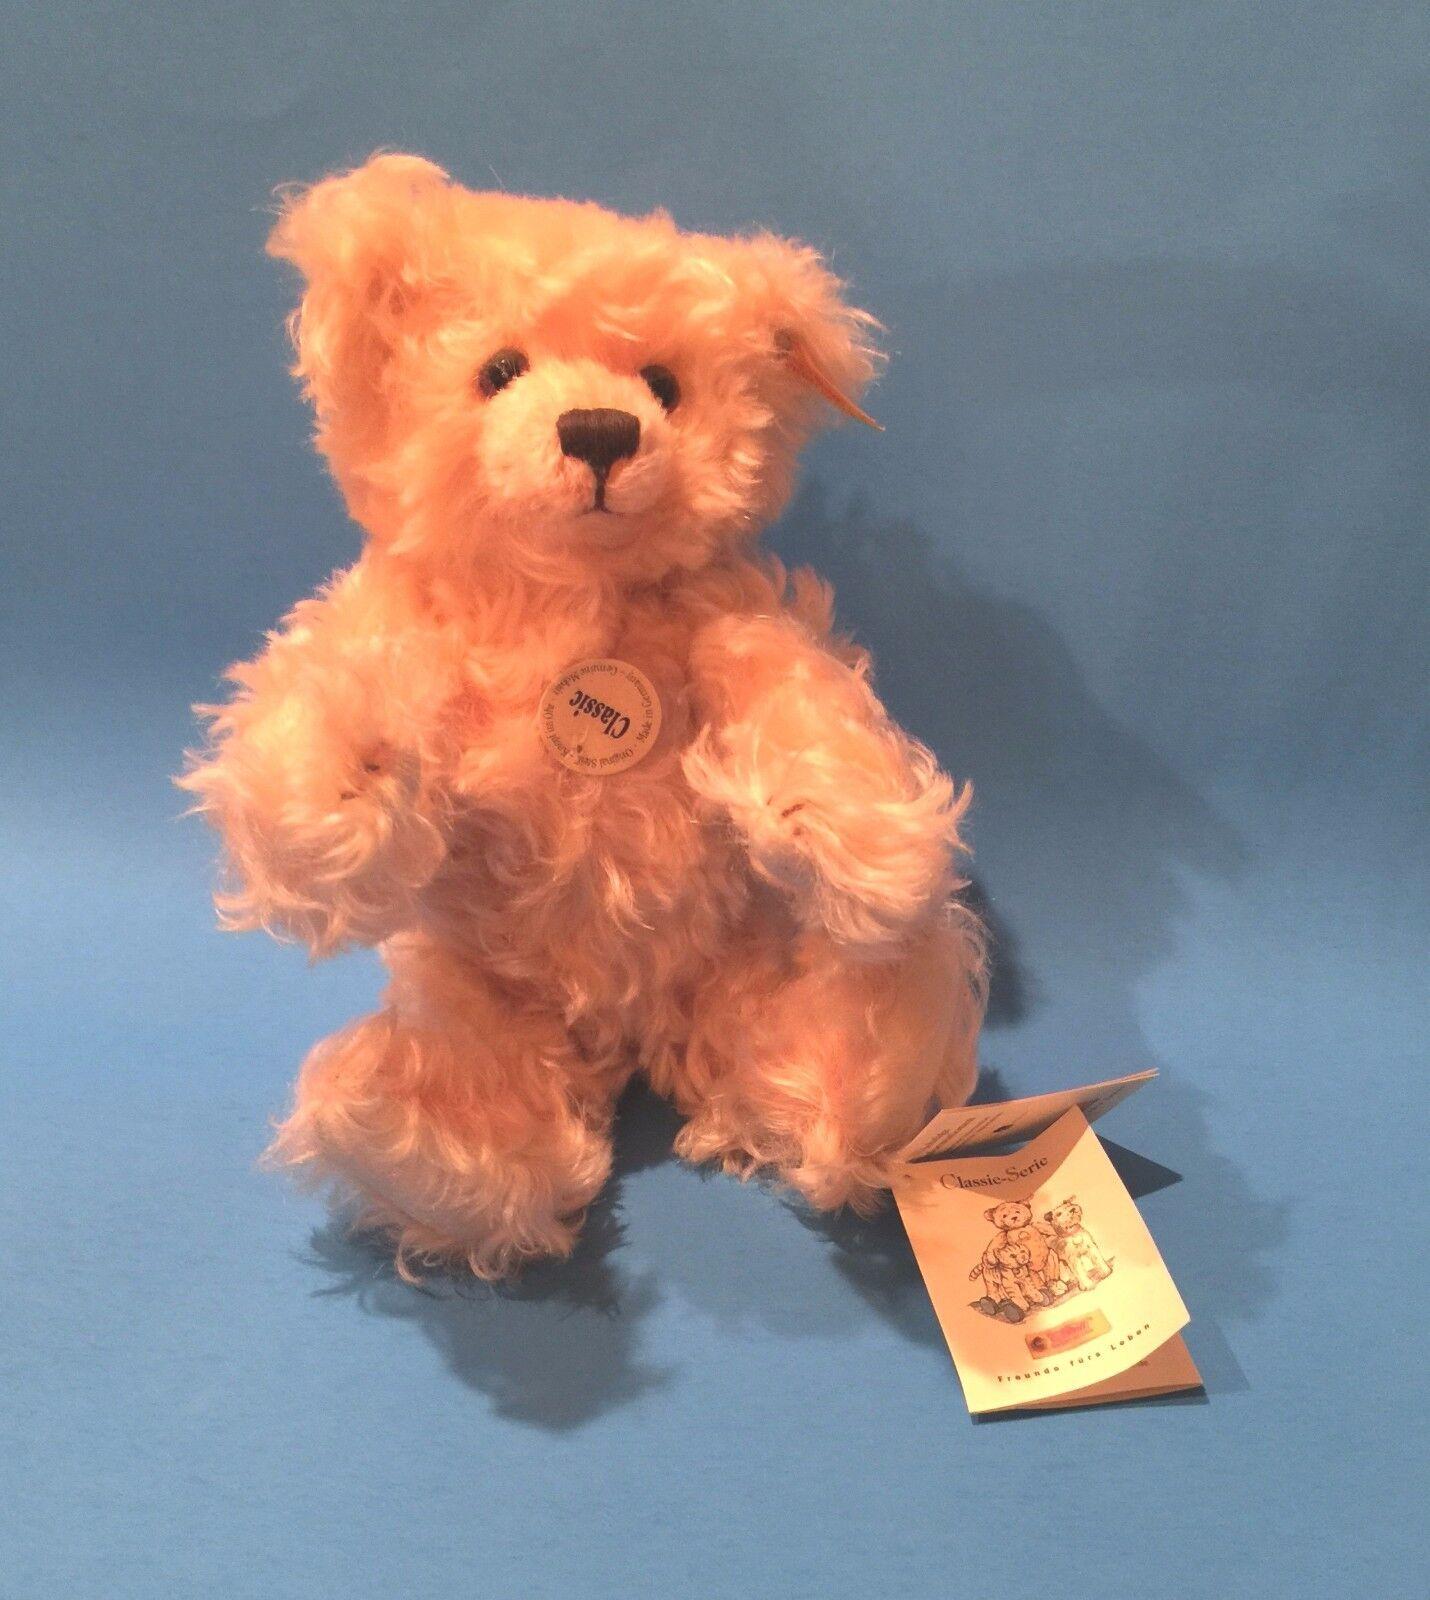 STEIFF  CLASSIC TEDDY BEAR   EAN 005015 APRICOT MOHAIR WITH SQUEAKE 11 1 2